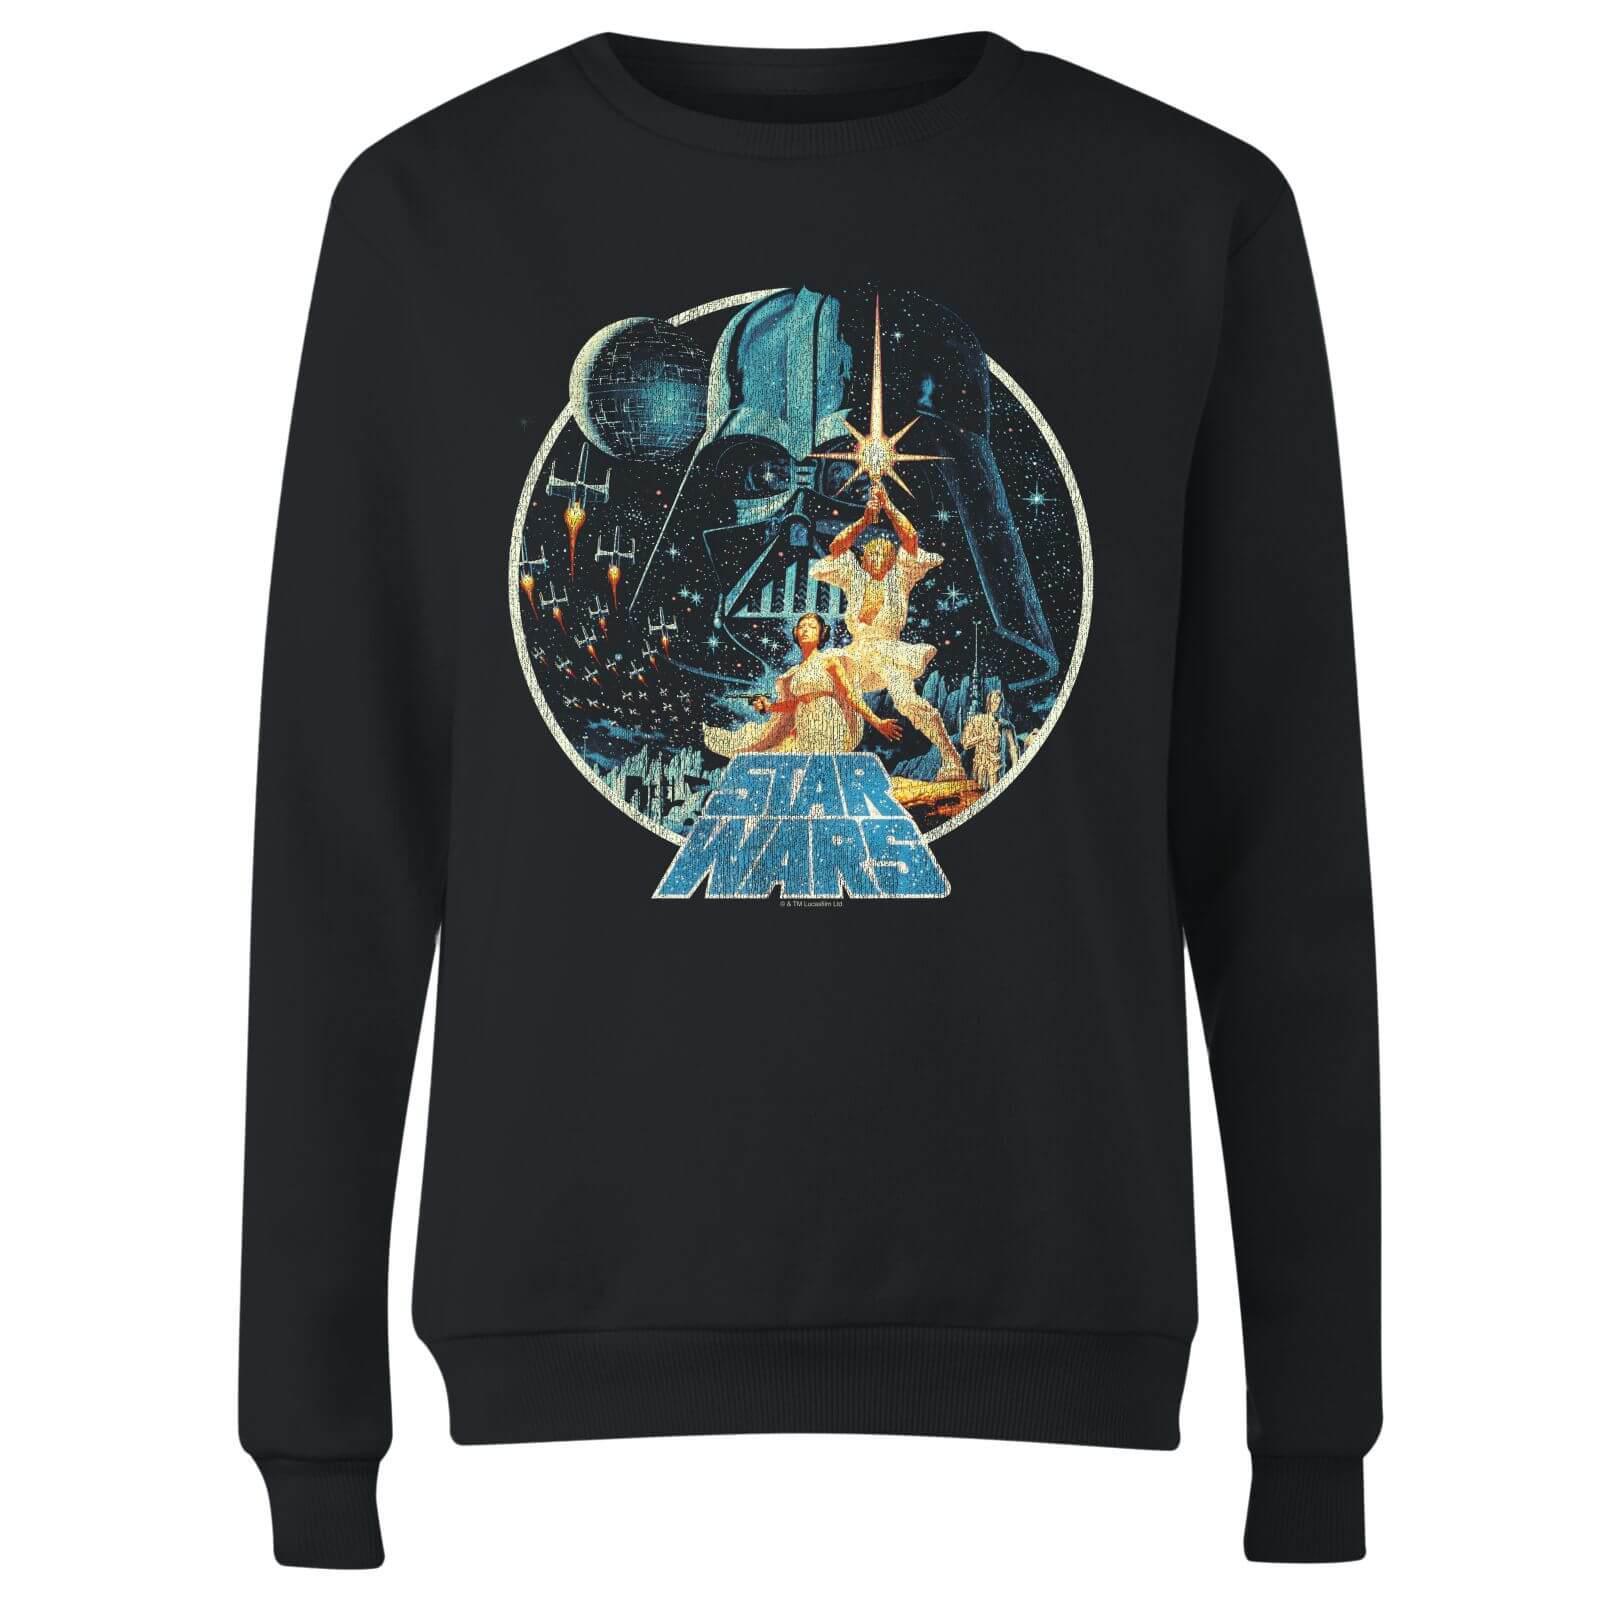 c4a400f24fe6 Star Wars Vintage Victory Sweatshirt in Black - Lyst